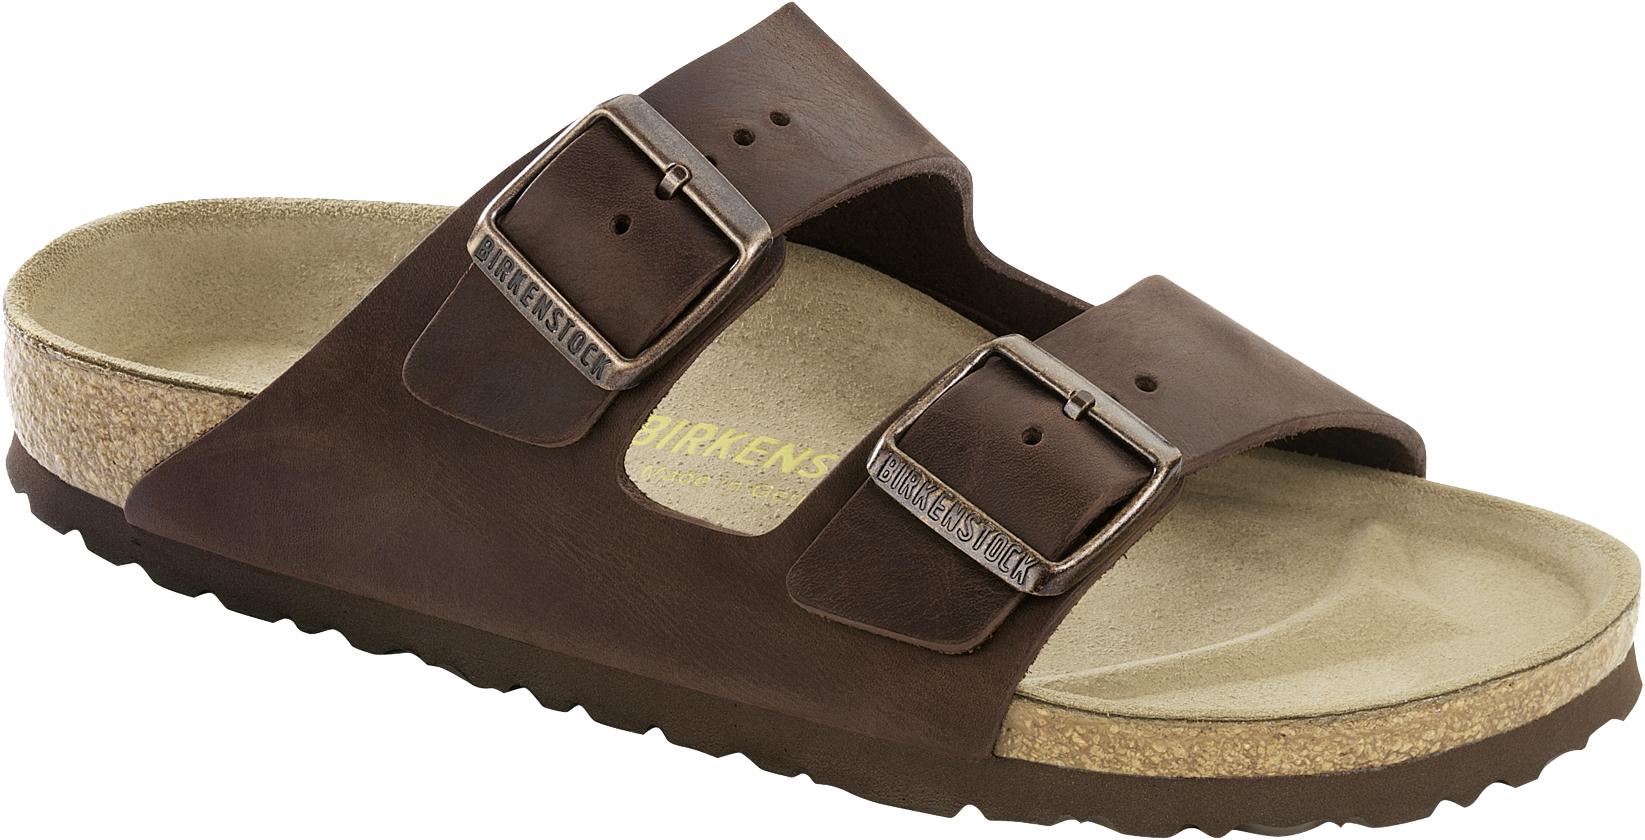 b119cd4dc Birkenstock Arizona Leather Sandals - Unisex | MEC